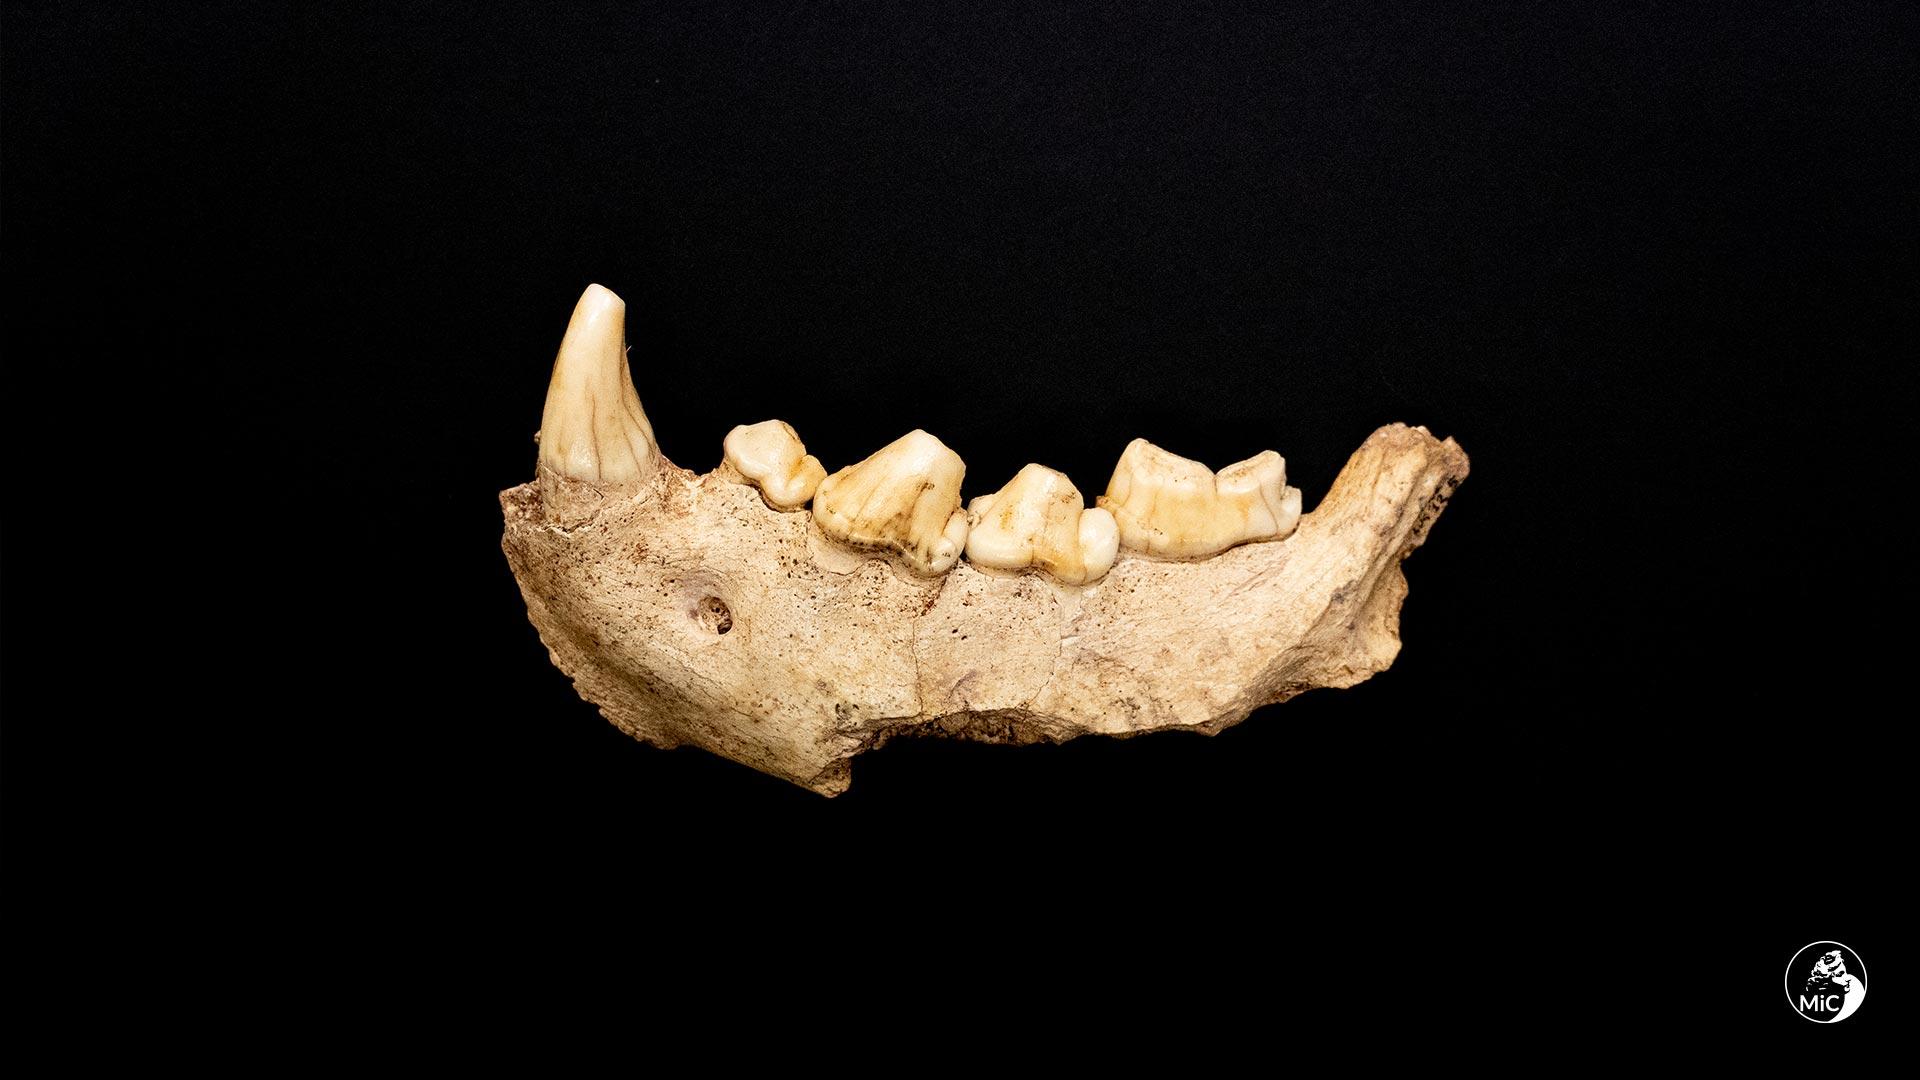 circeo_grotta-guattari_Neanderthal_mandibola-iena_foto-mic